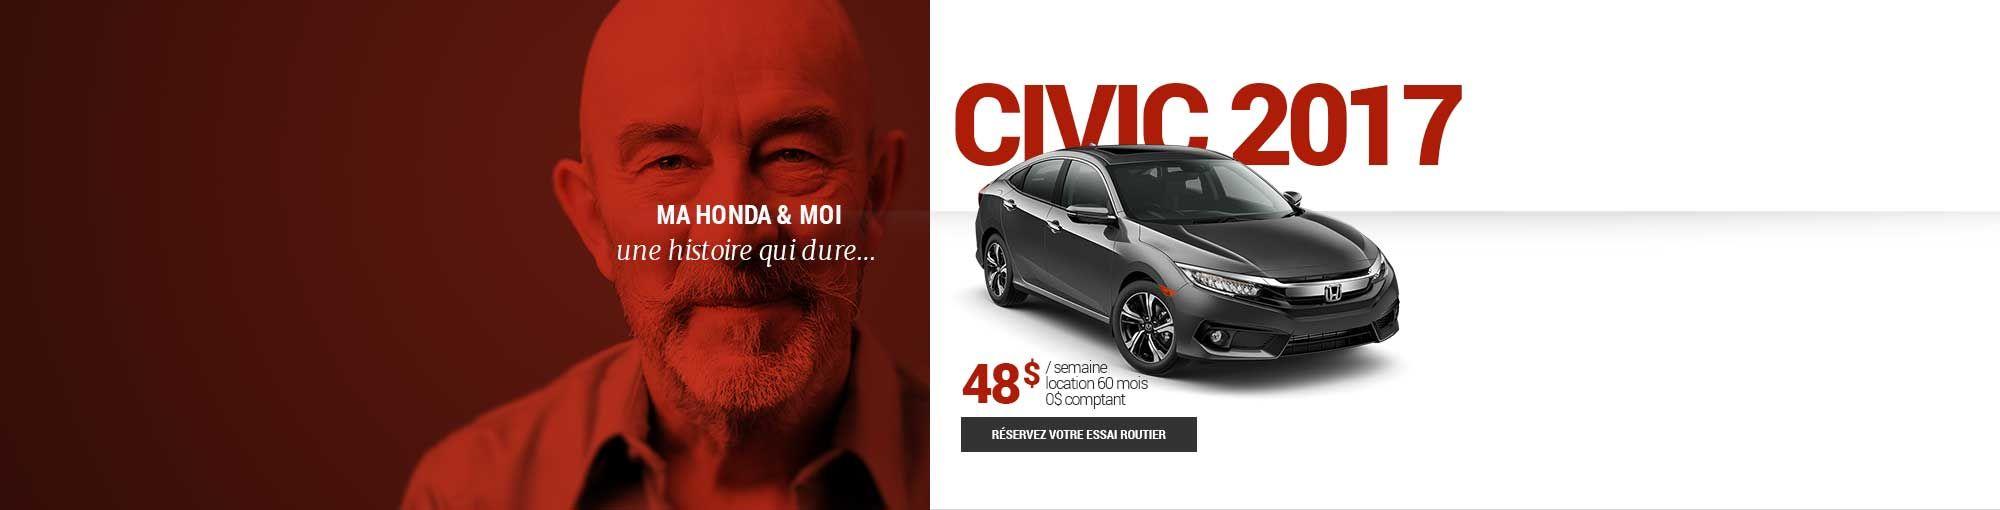 Civic 2017 - avril 2017